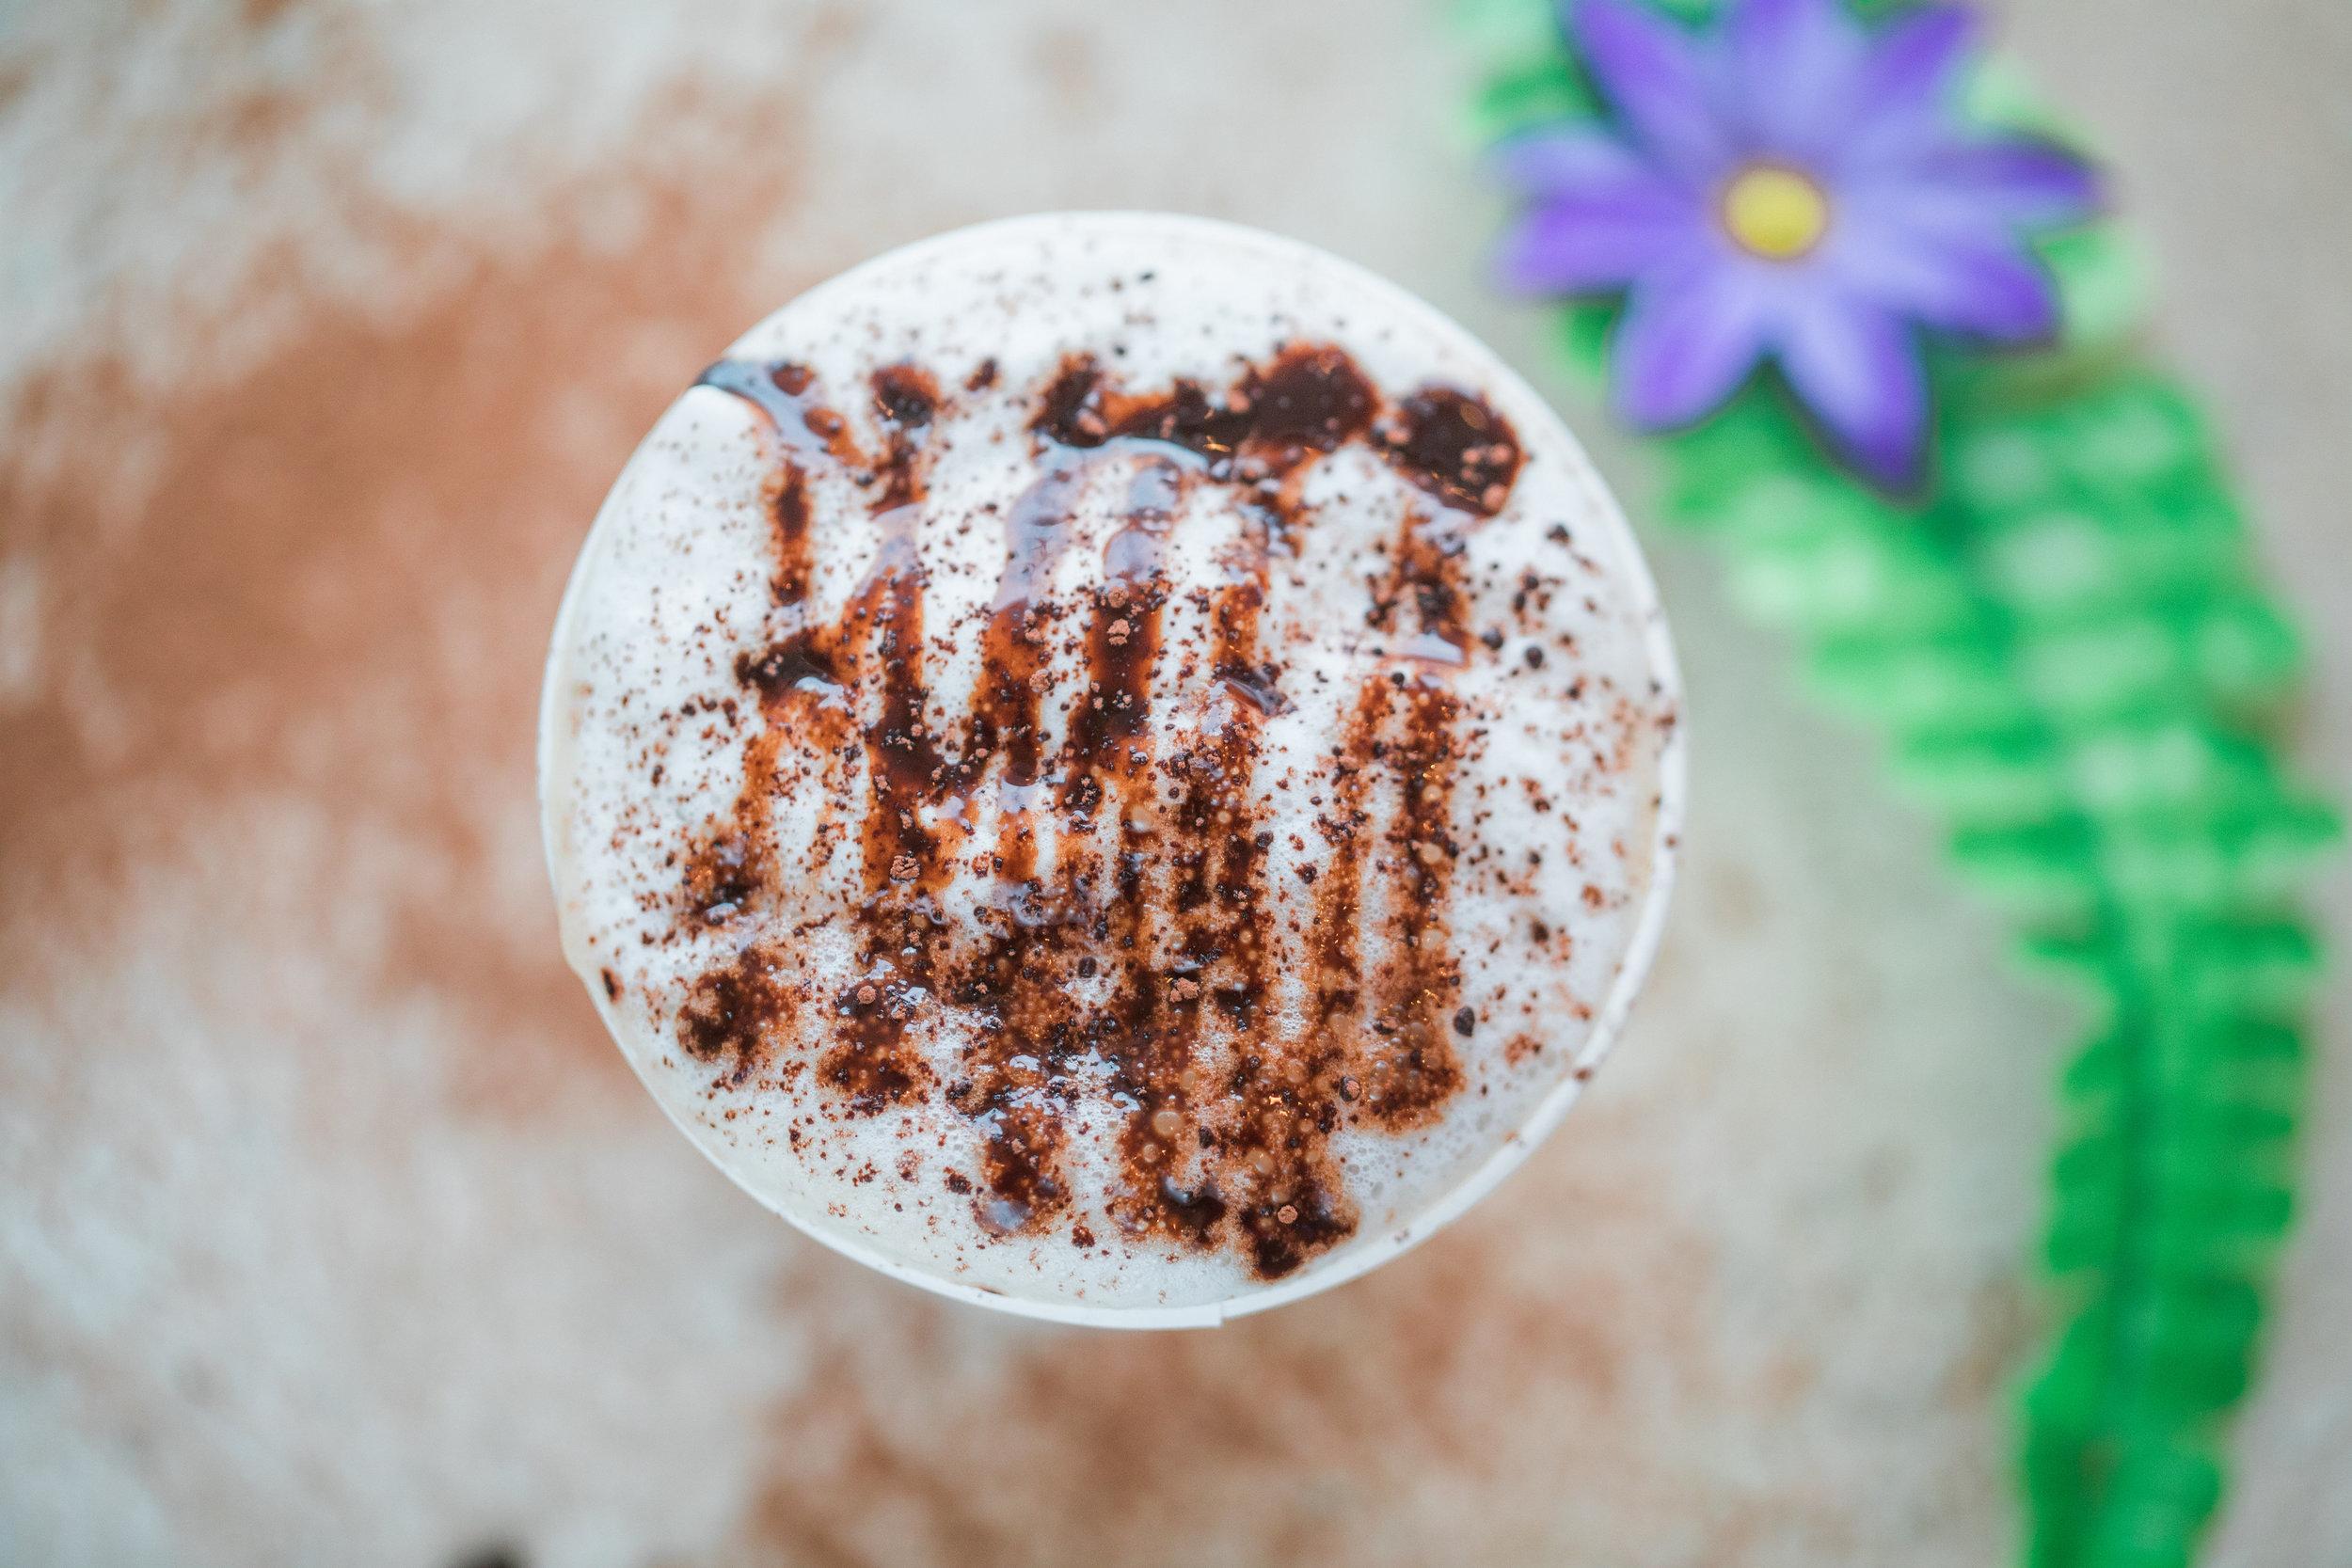 latte(close-up).jpg